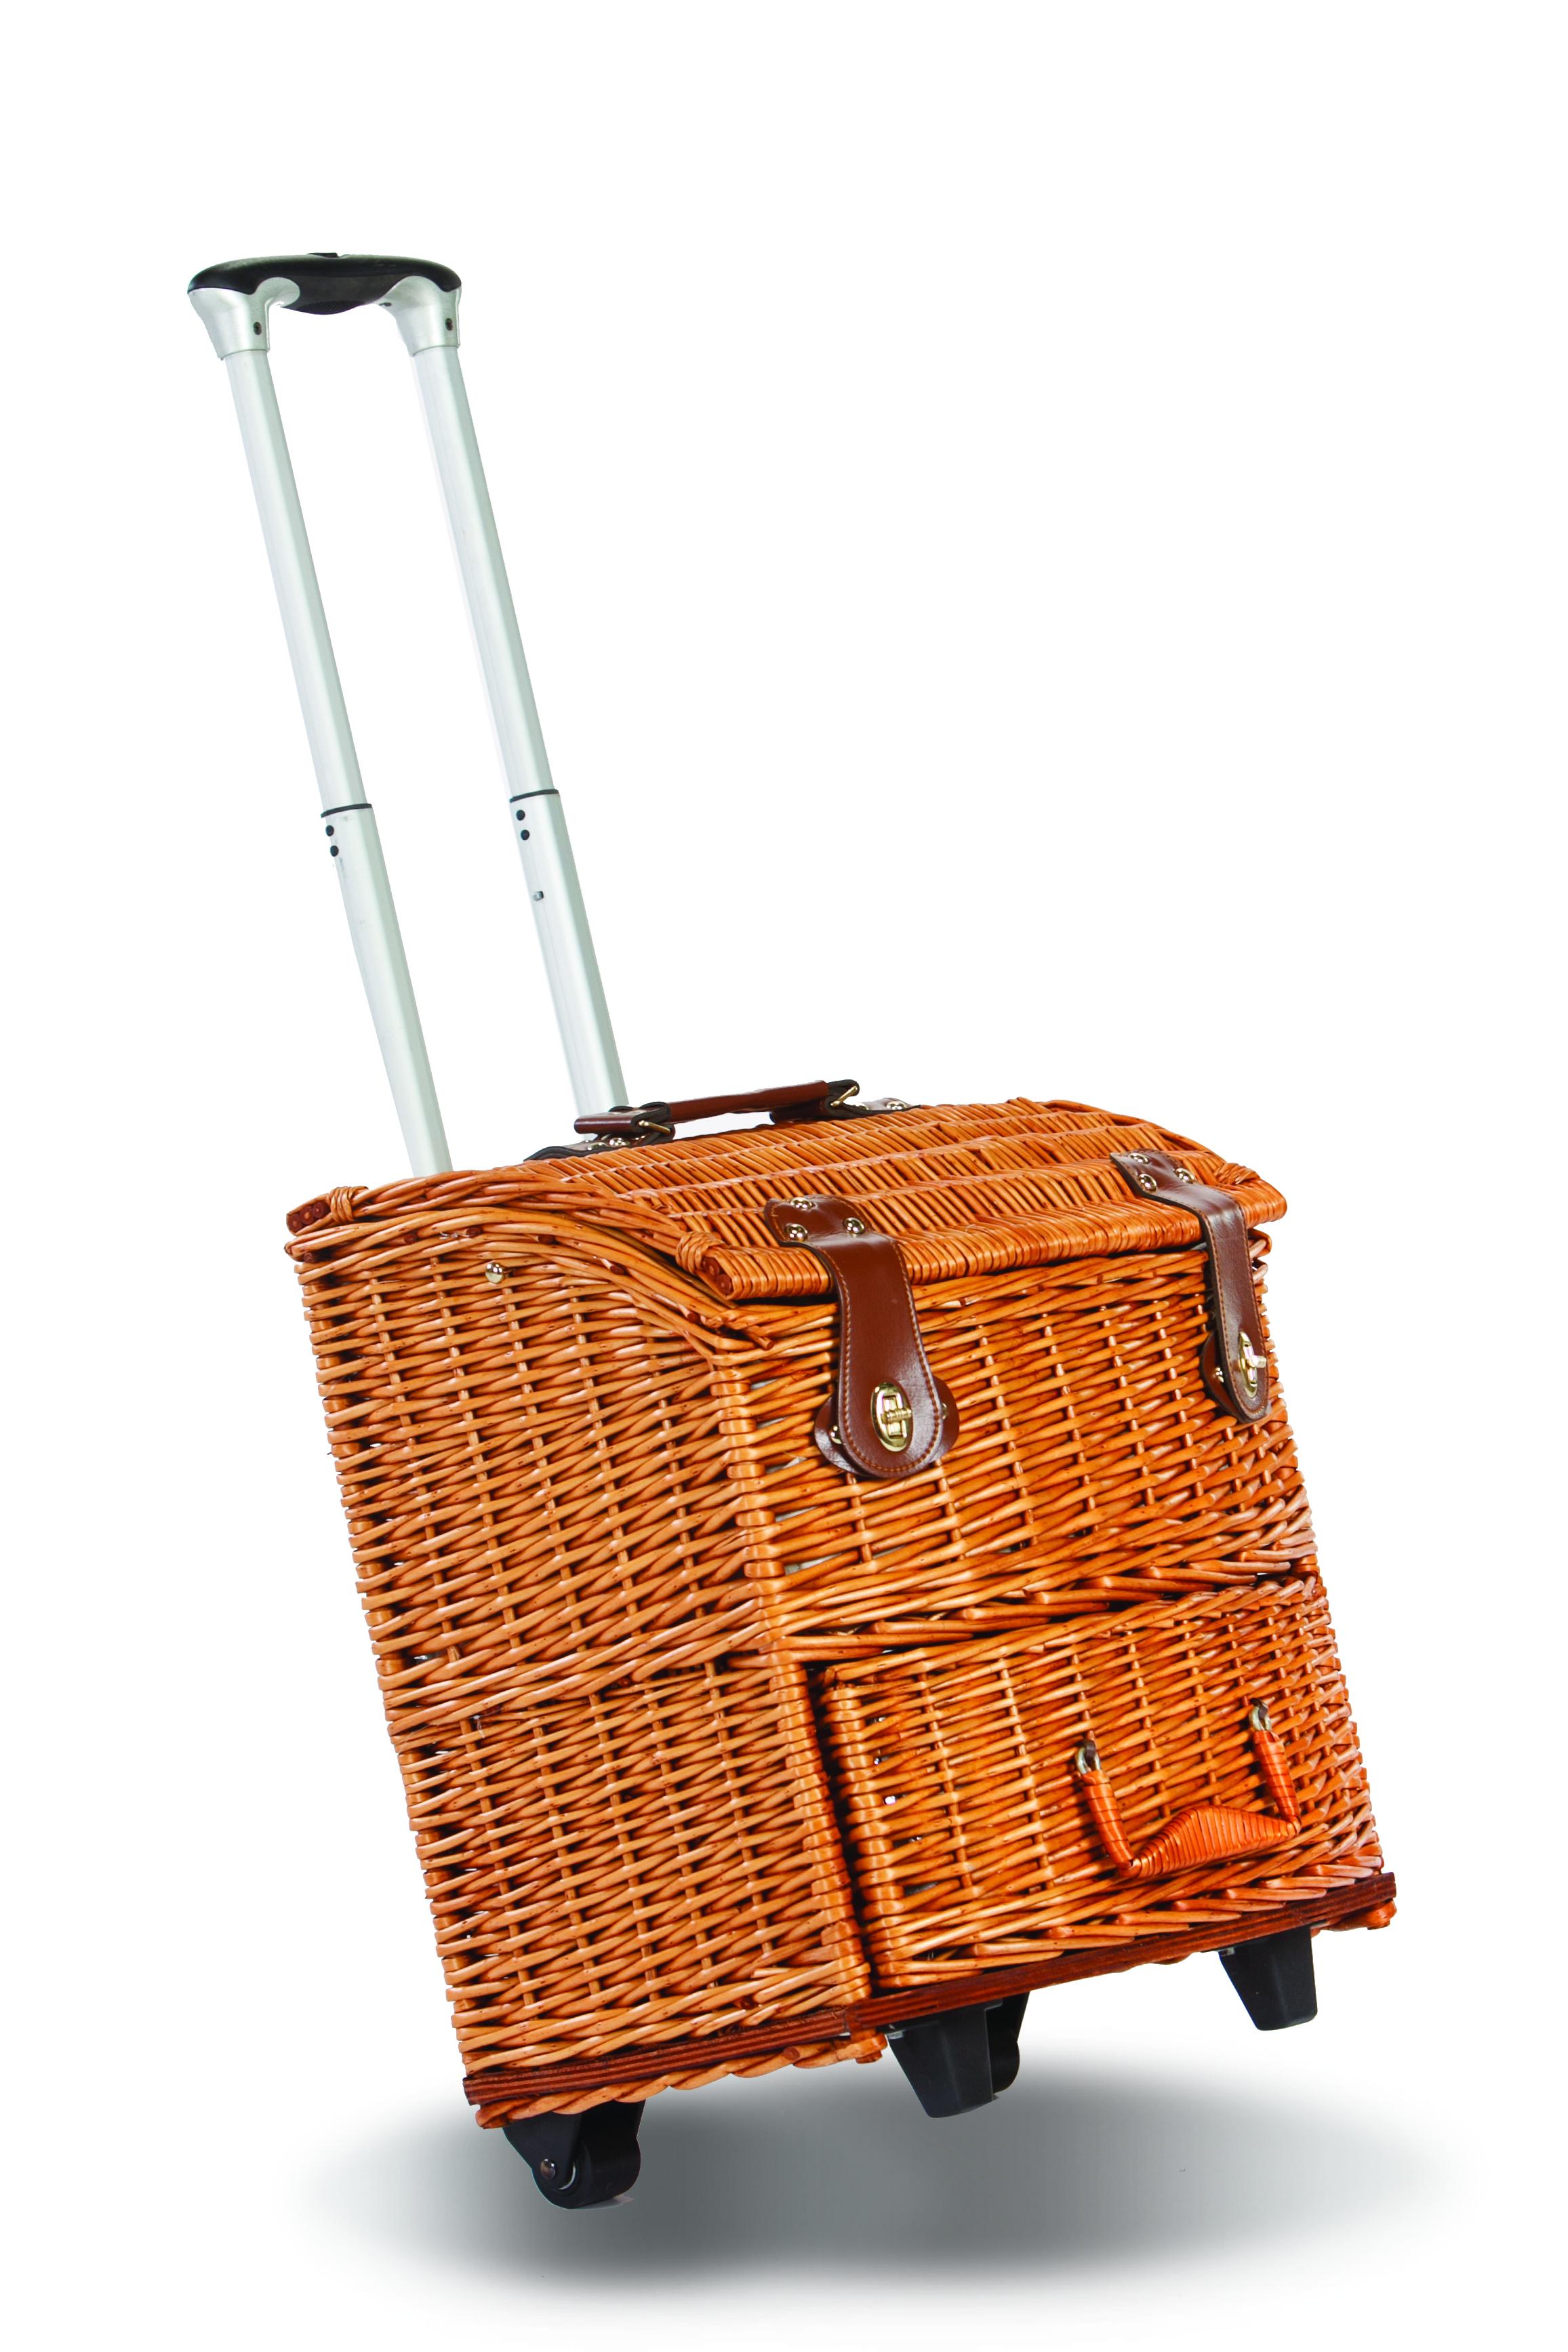 picnic plus exeter 4 person picnic basket on wheels vine